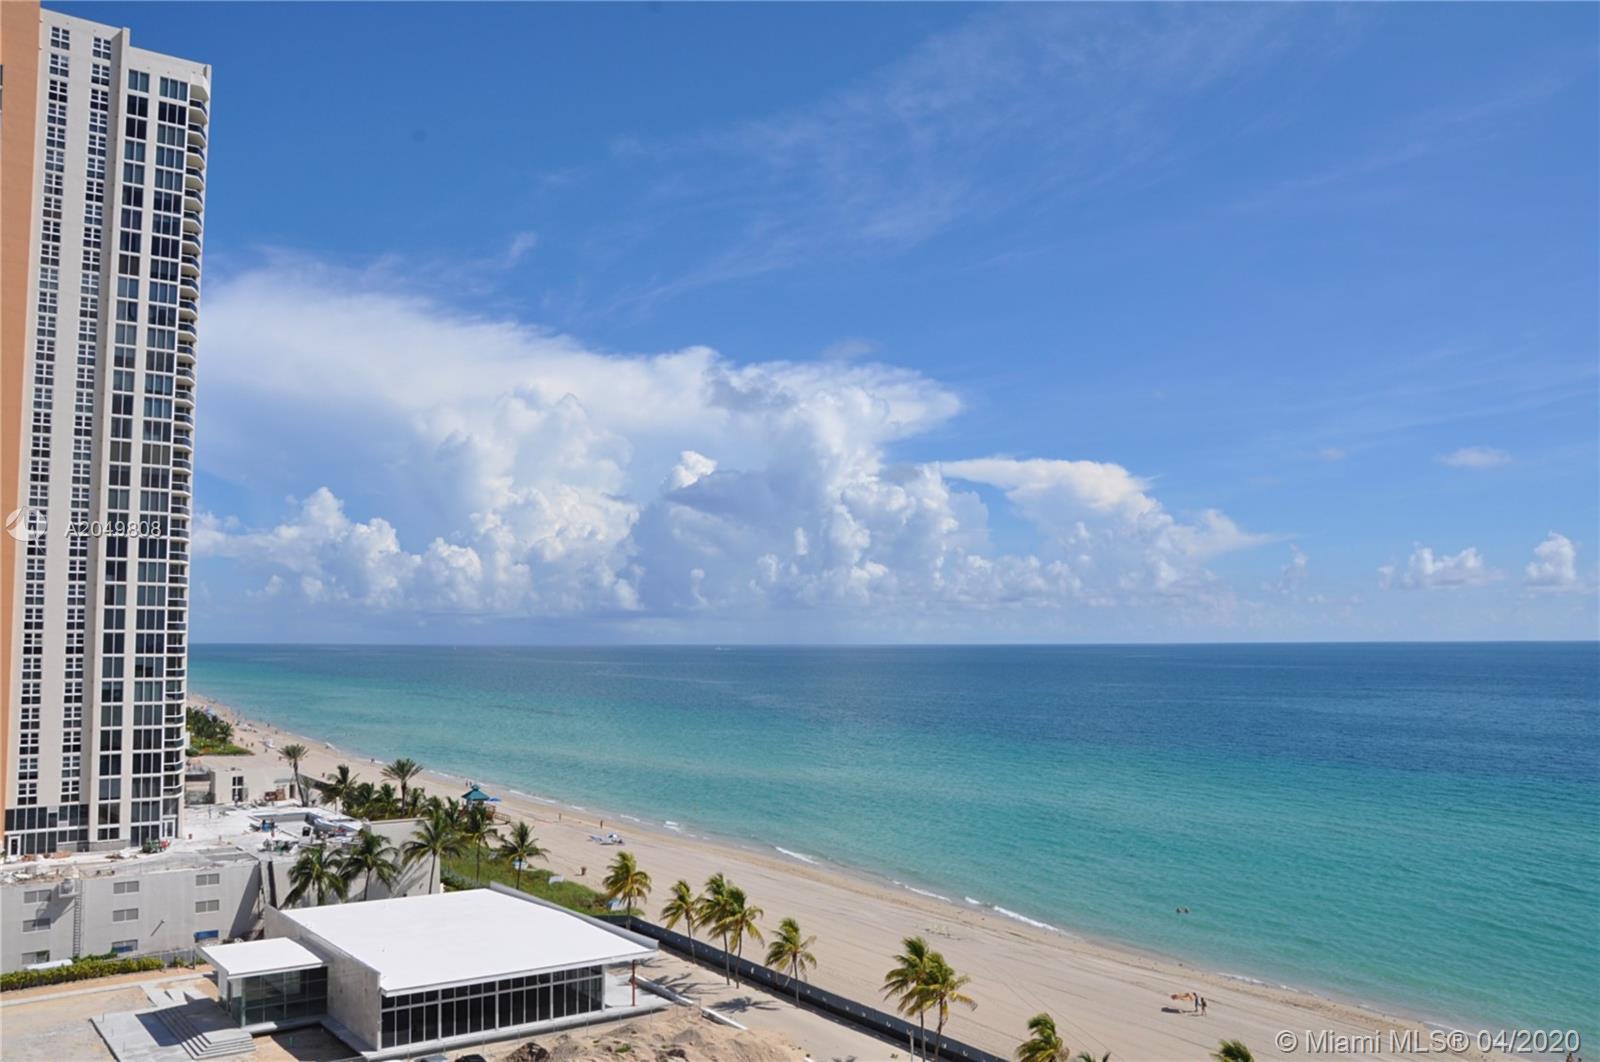 18683 COLLINS AV # 603, Sunny Isles Beach, Florida 33160, 1 Bedroom Bedrooms, ,1 BathroomBathrooms,Residential Lease,For Rent,18683 COLLINS AV # 603,A2049808